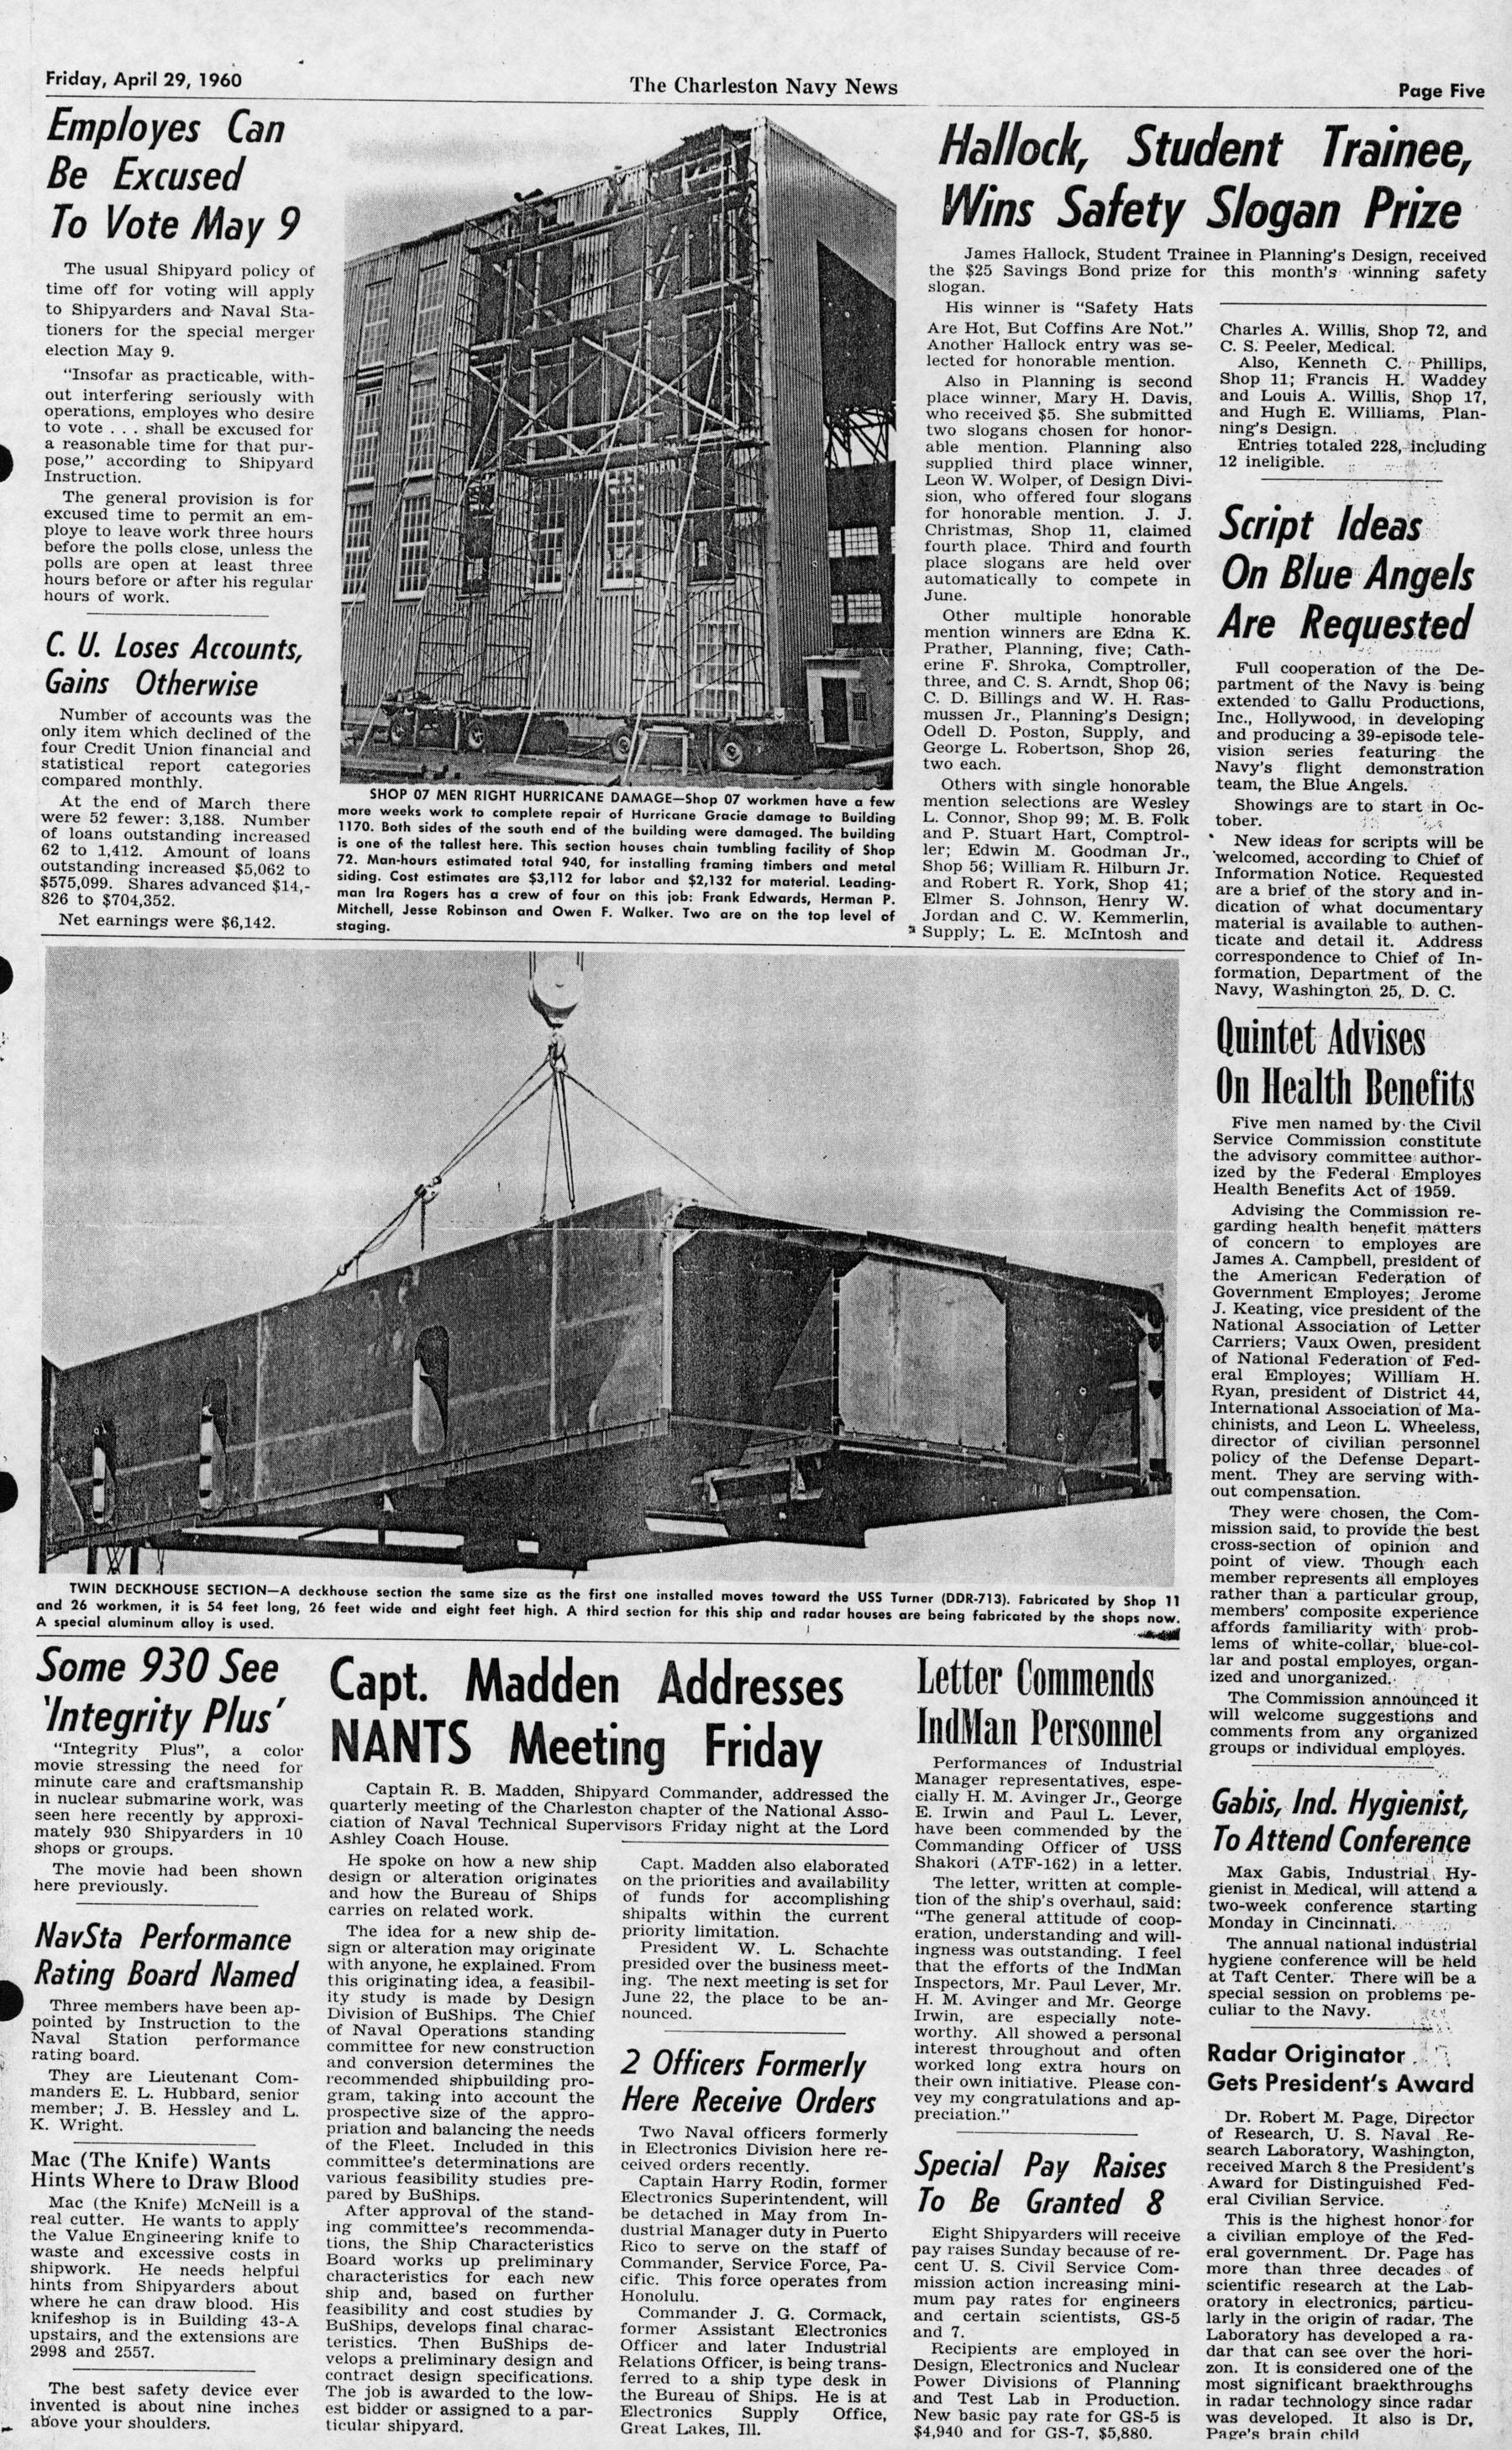 The Charleston Navy News, Volume 18, Edition 21, page v